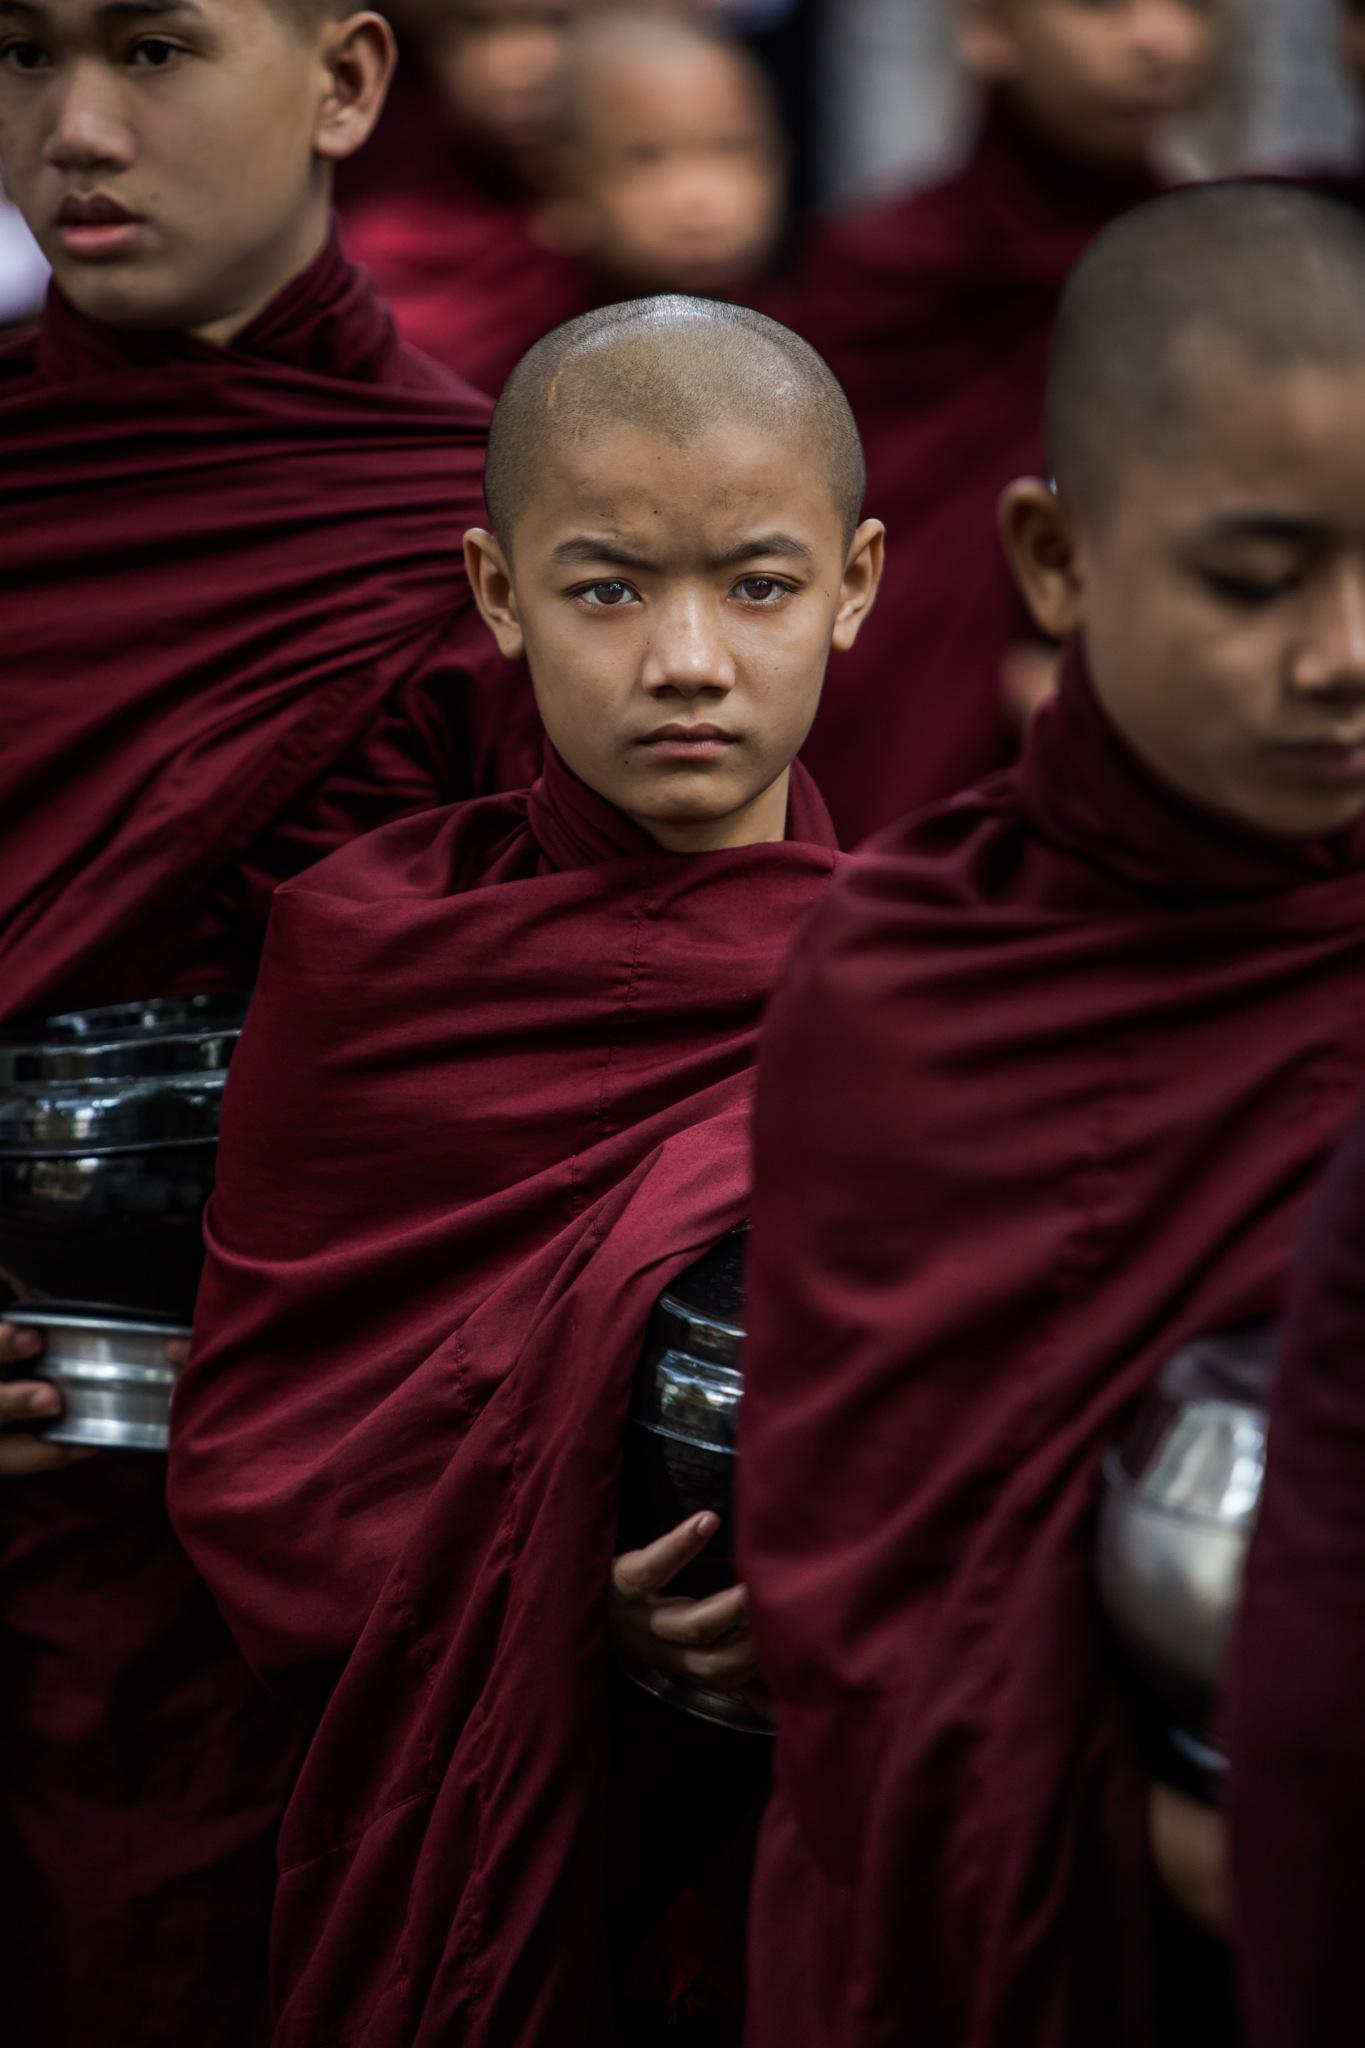 Monk's Procession by David Elliott